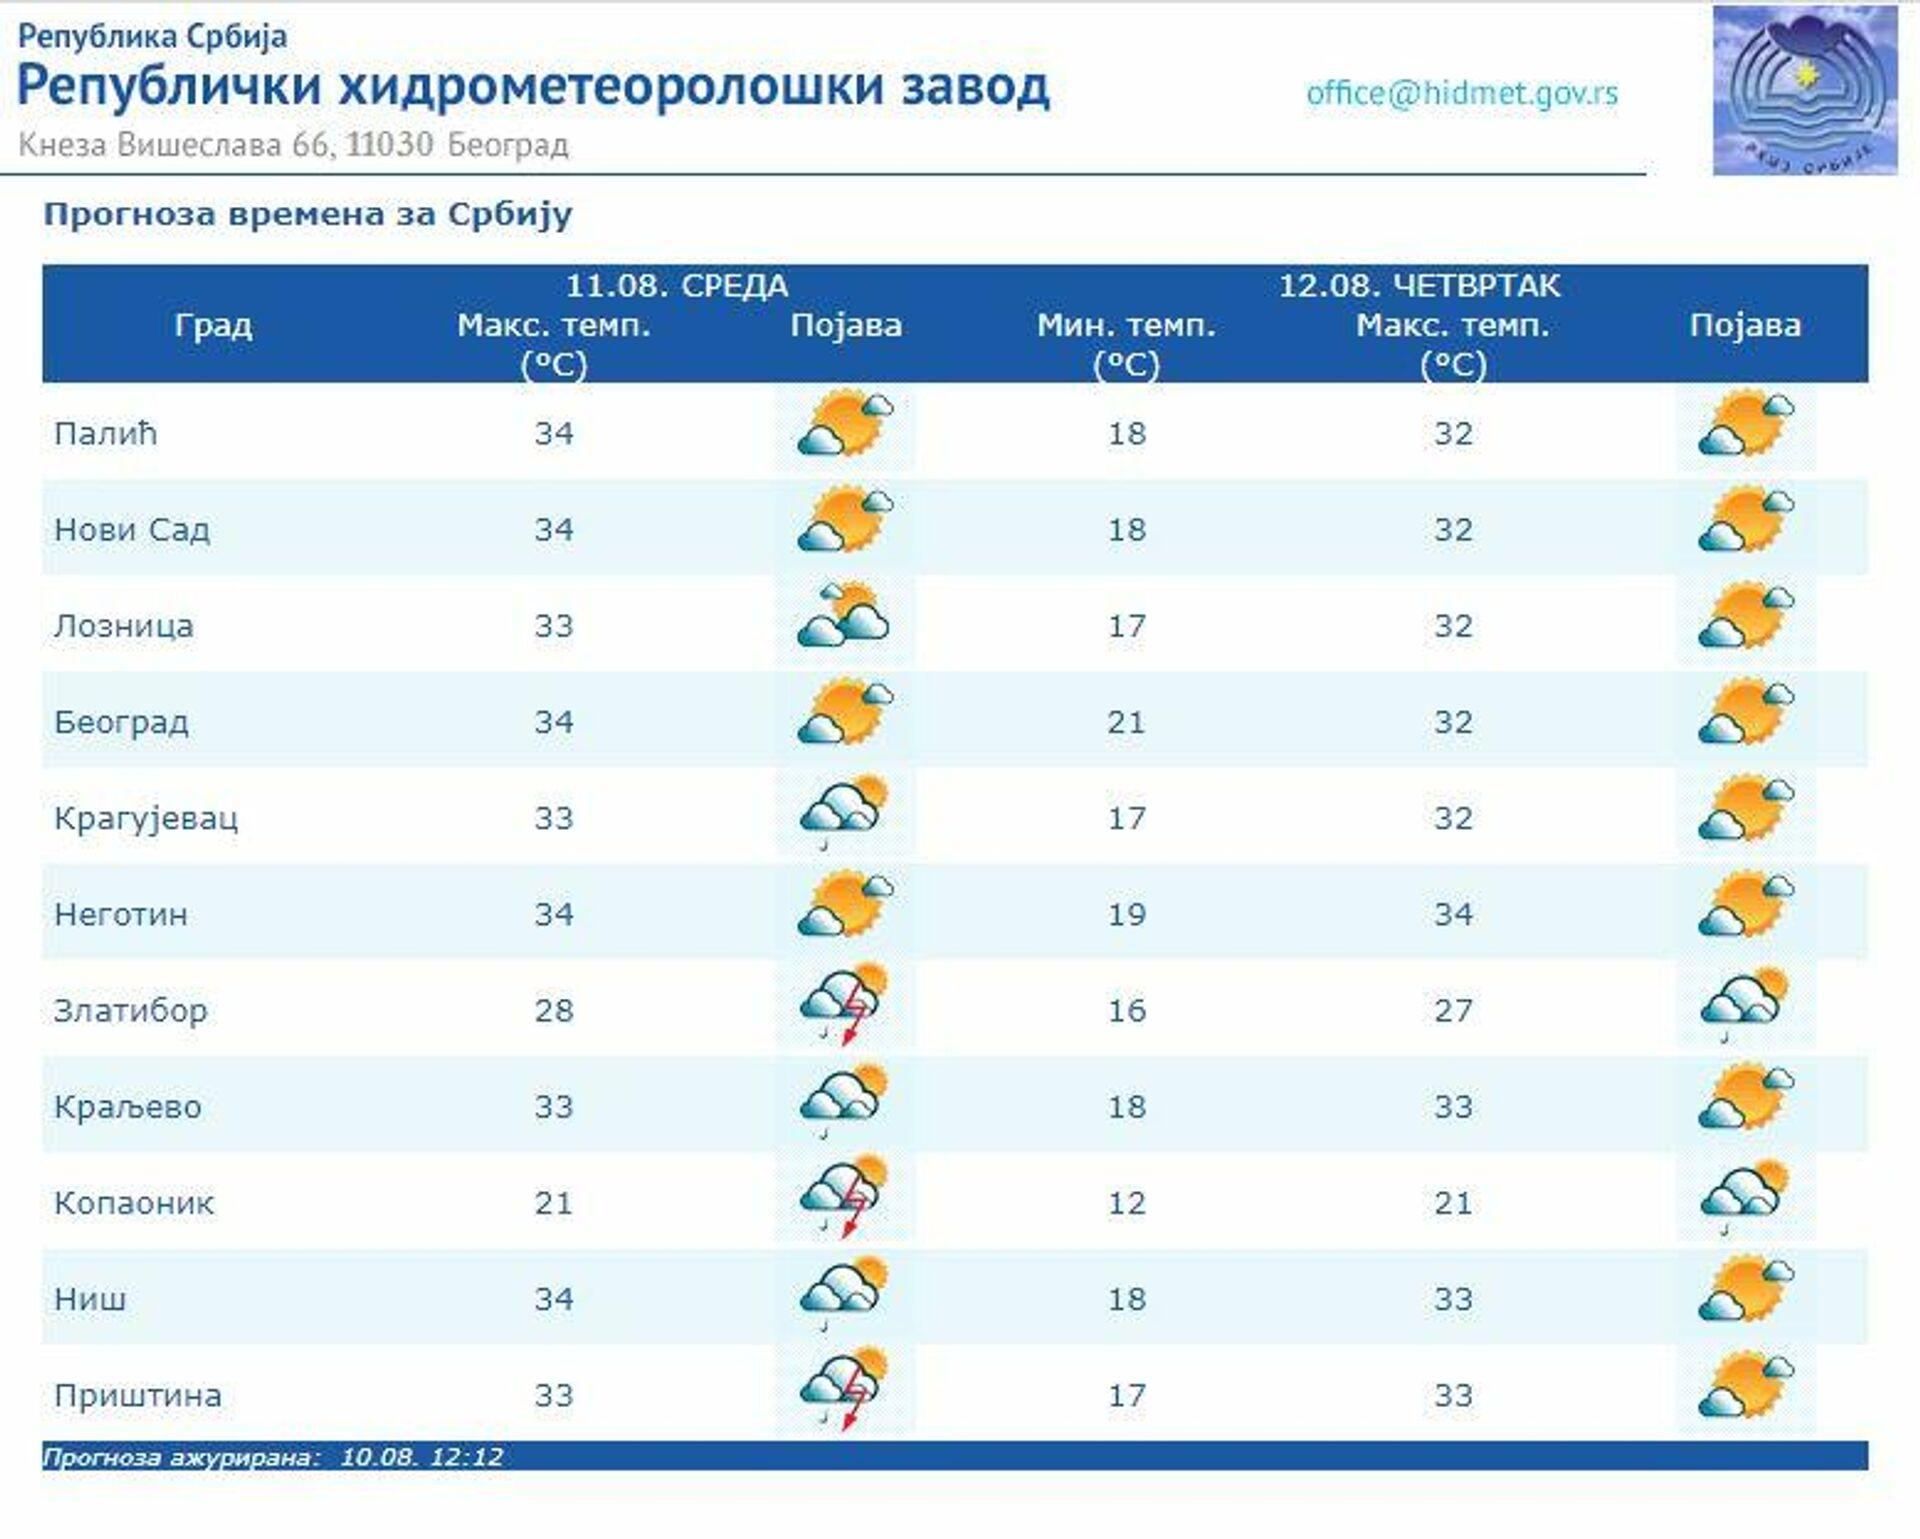 Временска прогноза за 11. август 2021. - Sputnik Србија, 1920, 11.08.2021